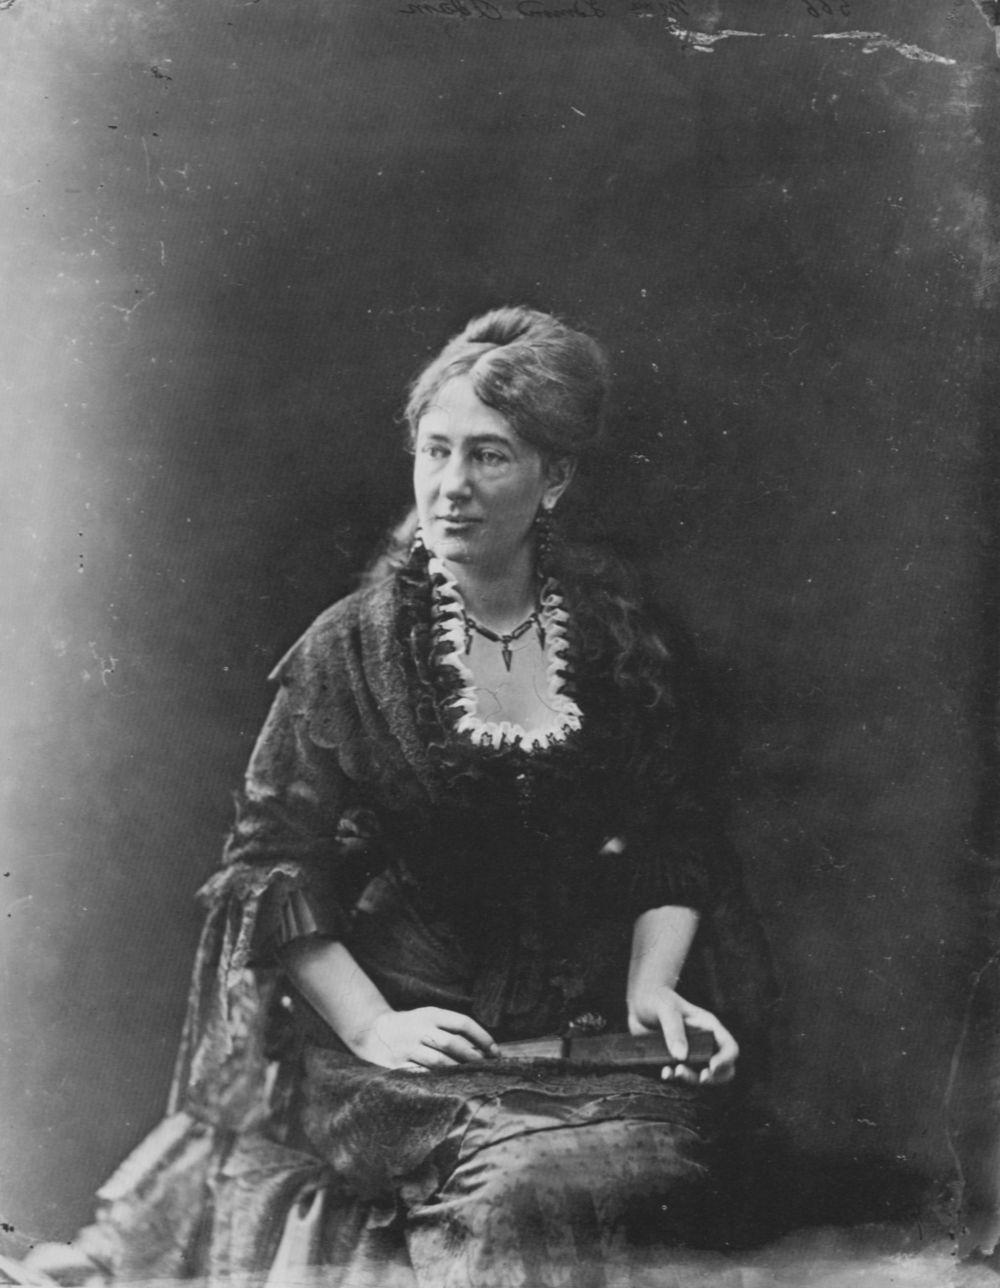 Juliette Adam (1836-1936)